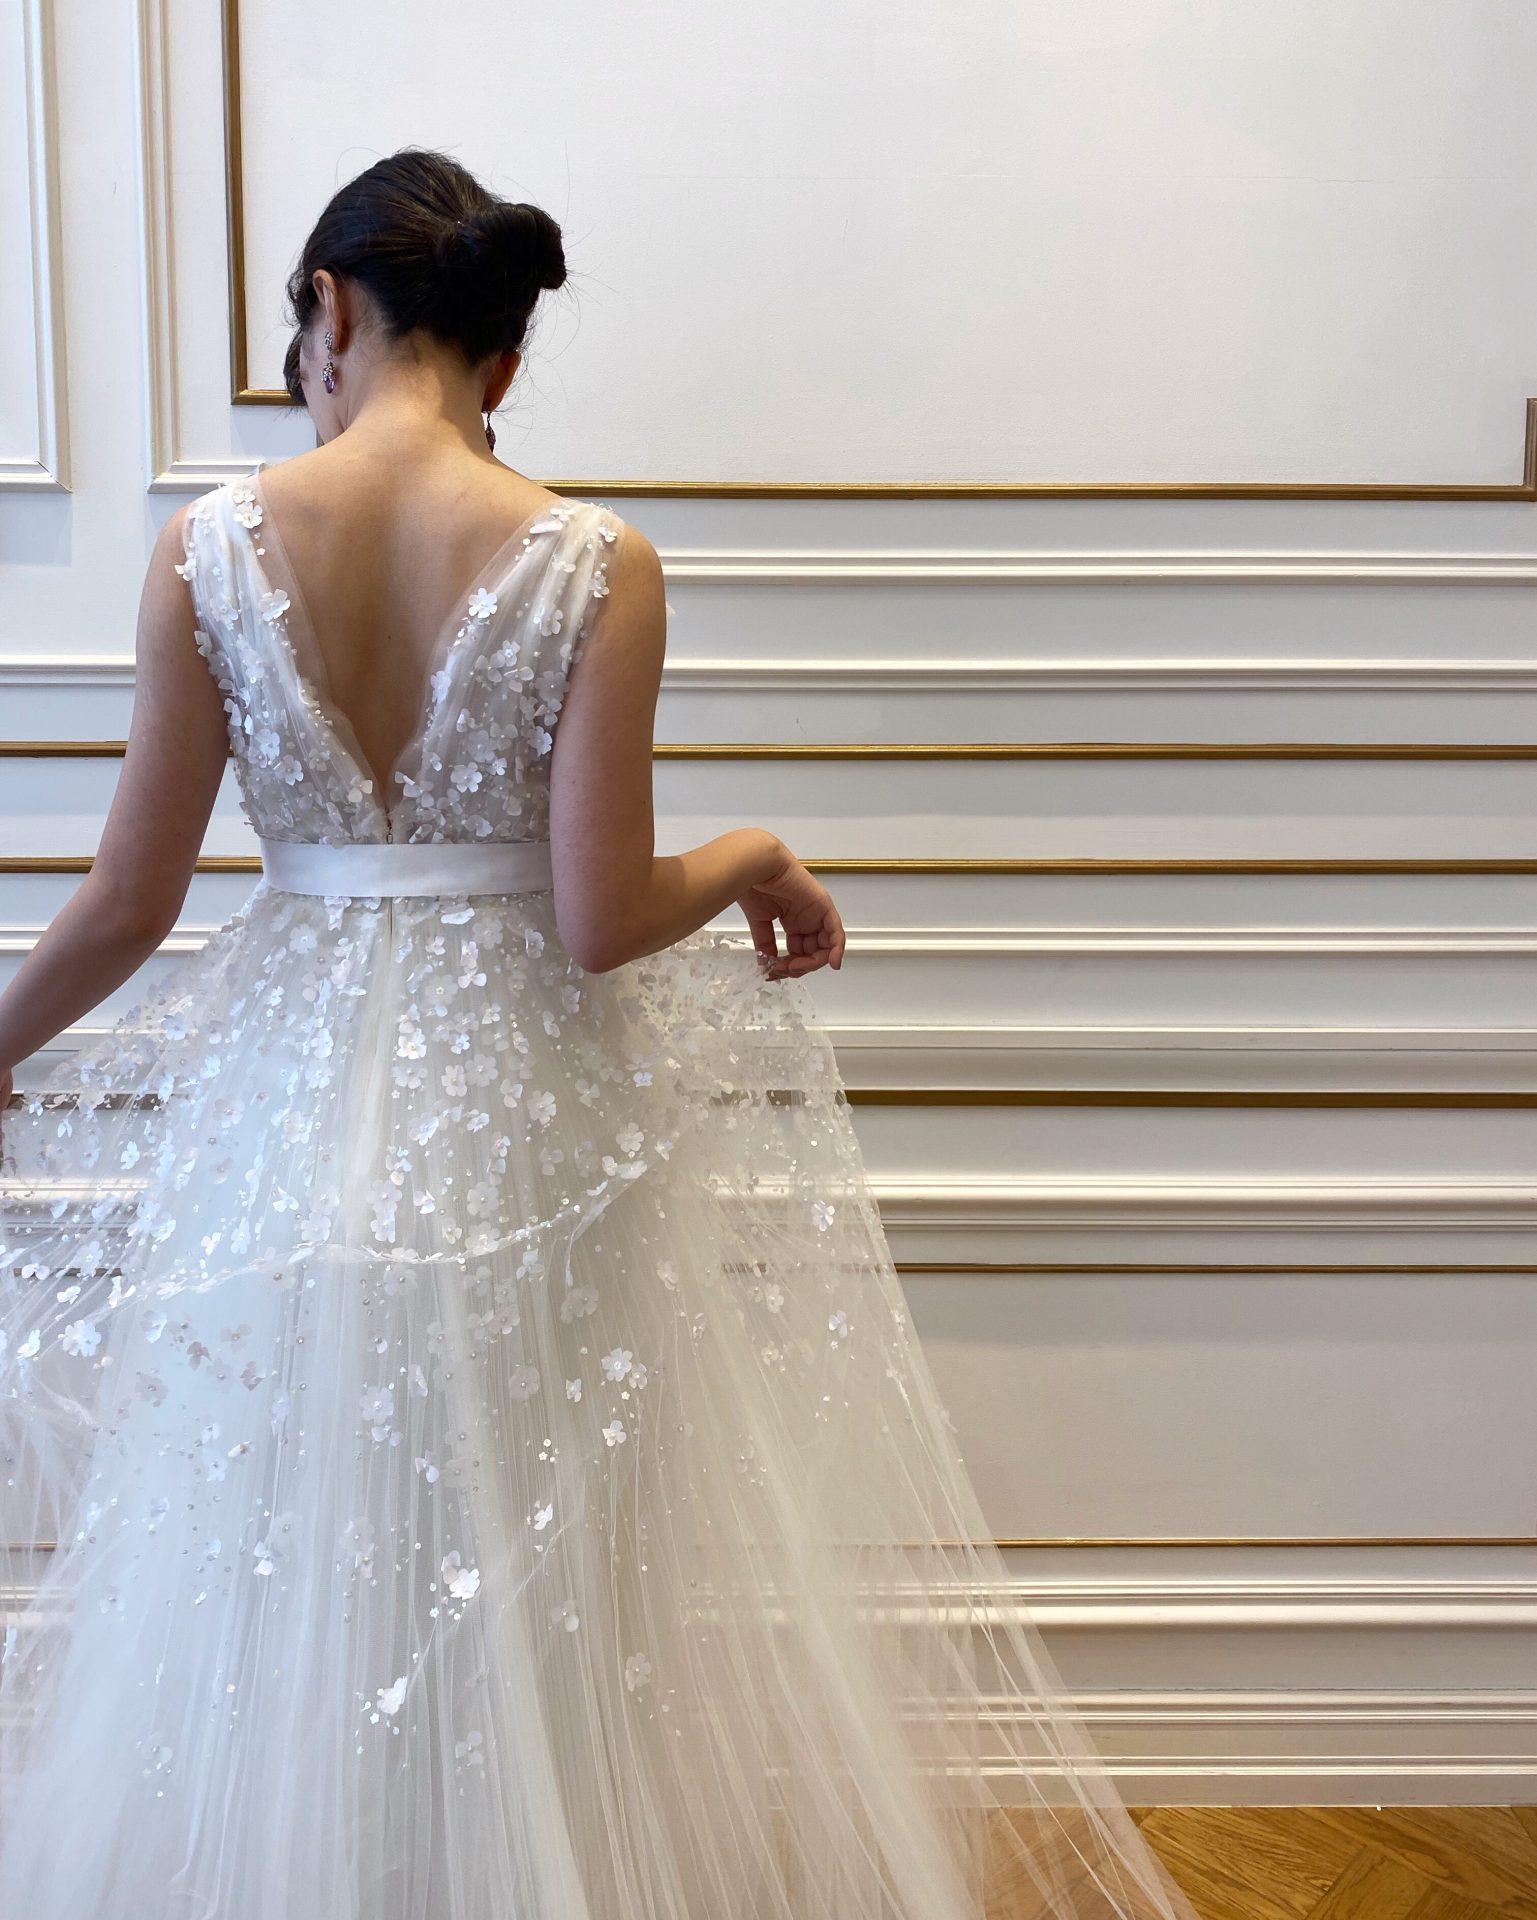 Dフラワーモチーフが可愛いオスカーデラレンタの新作のAラインのウェディングドレス